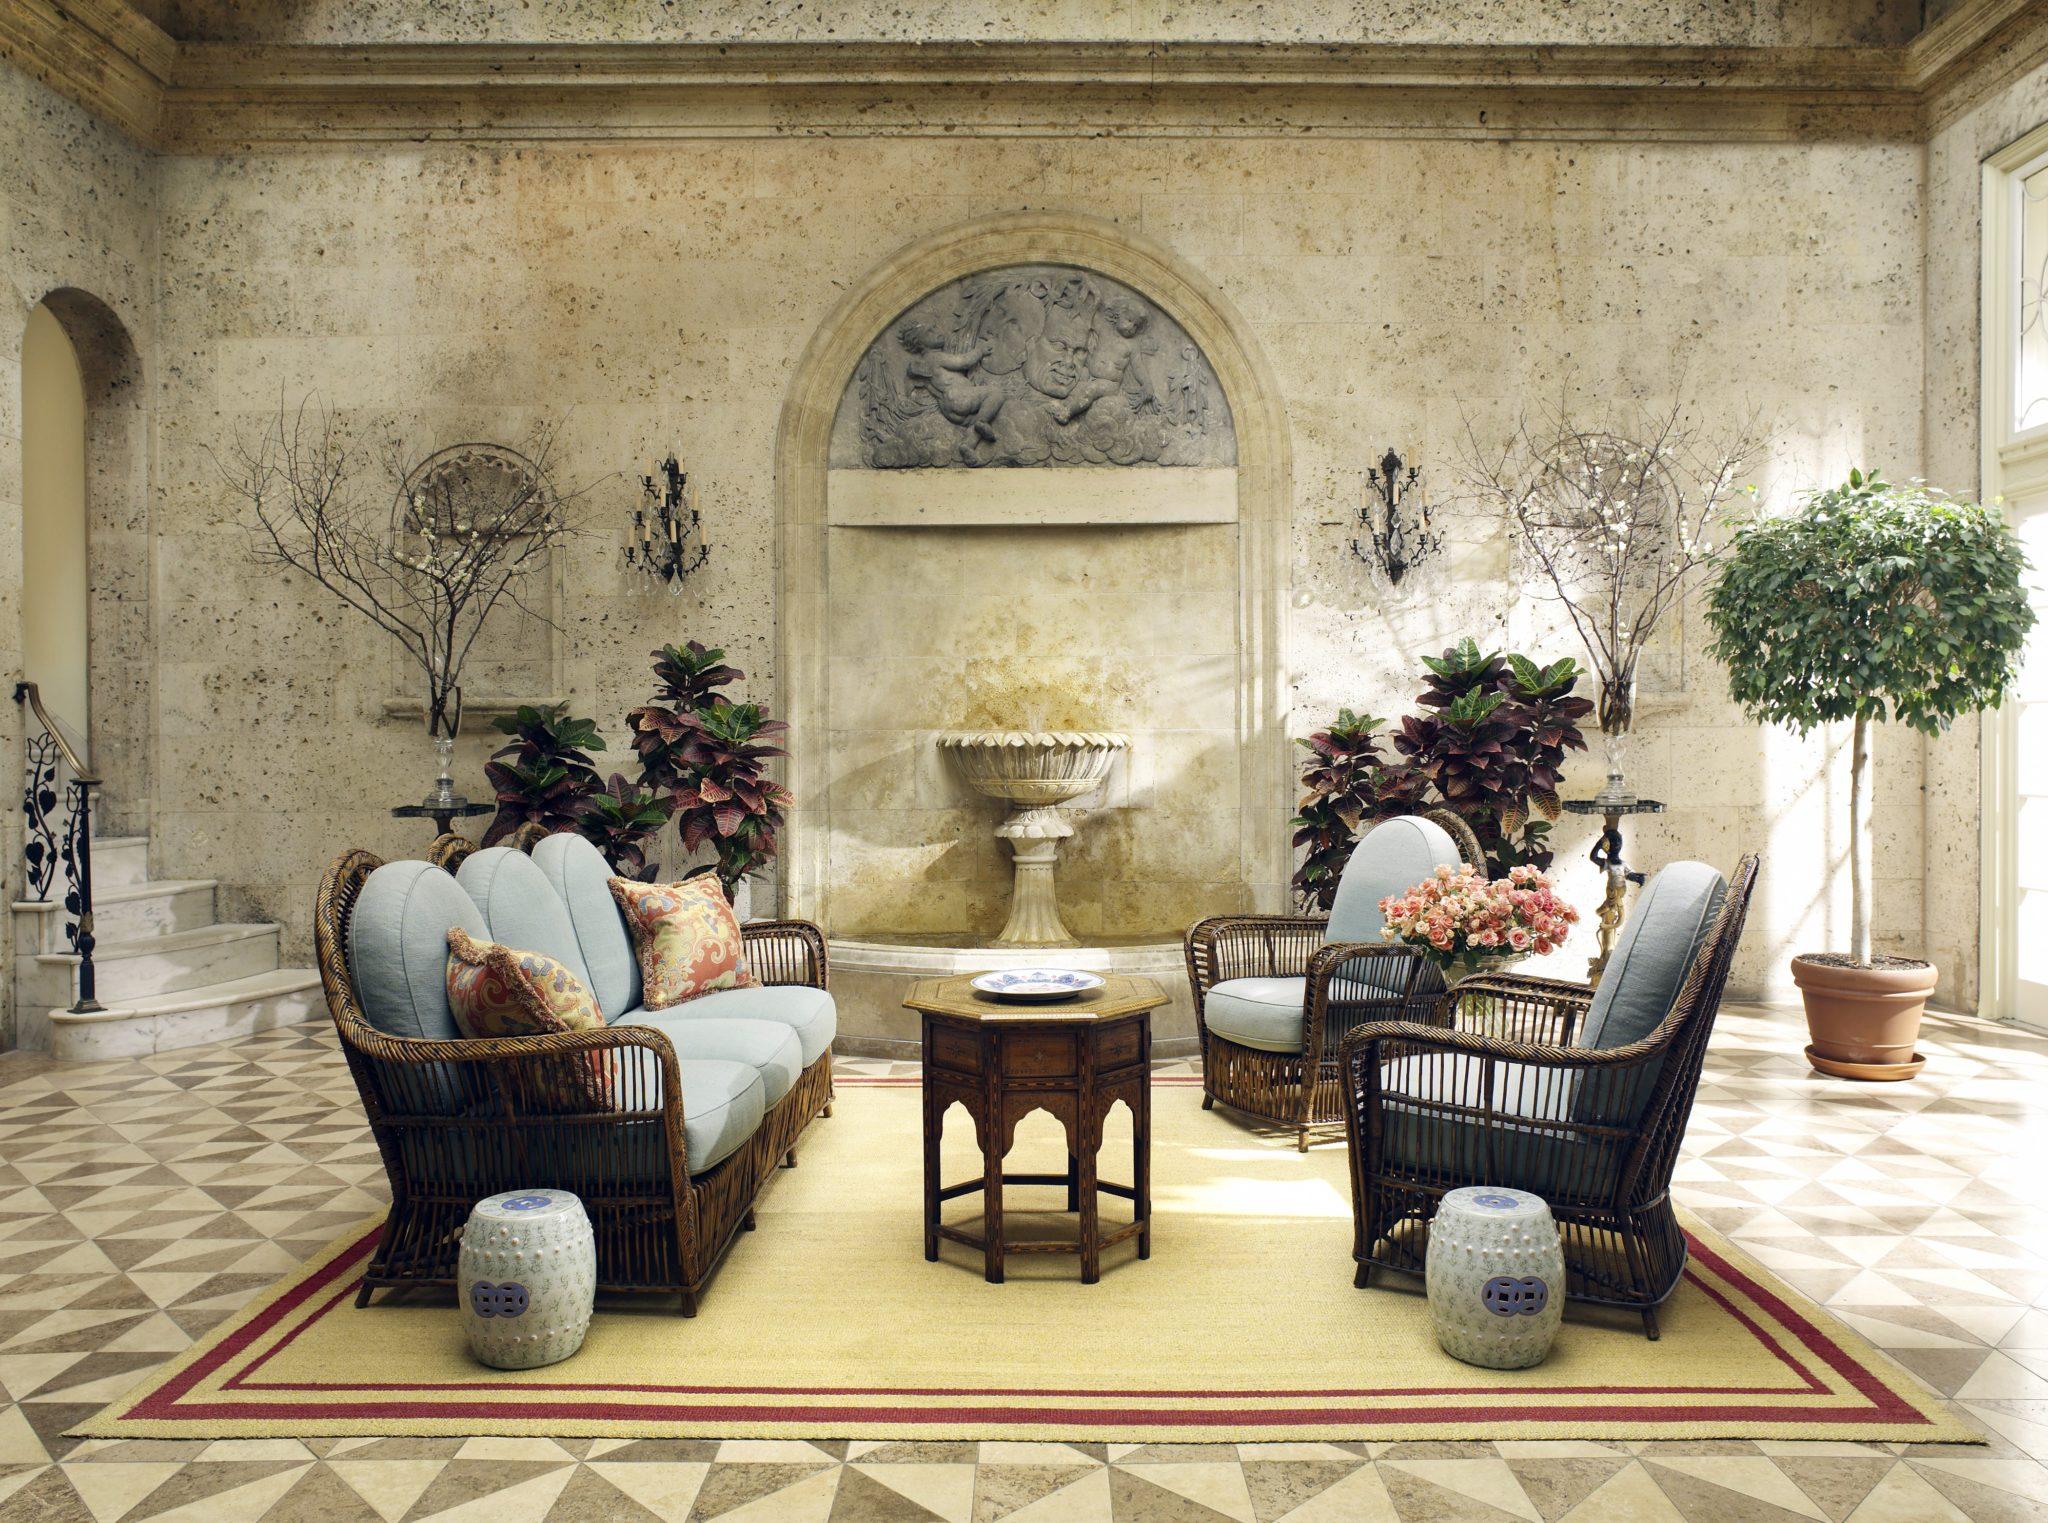 Interior design byJayne Design Studio, Inc.